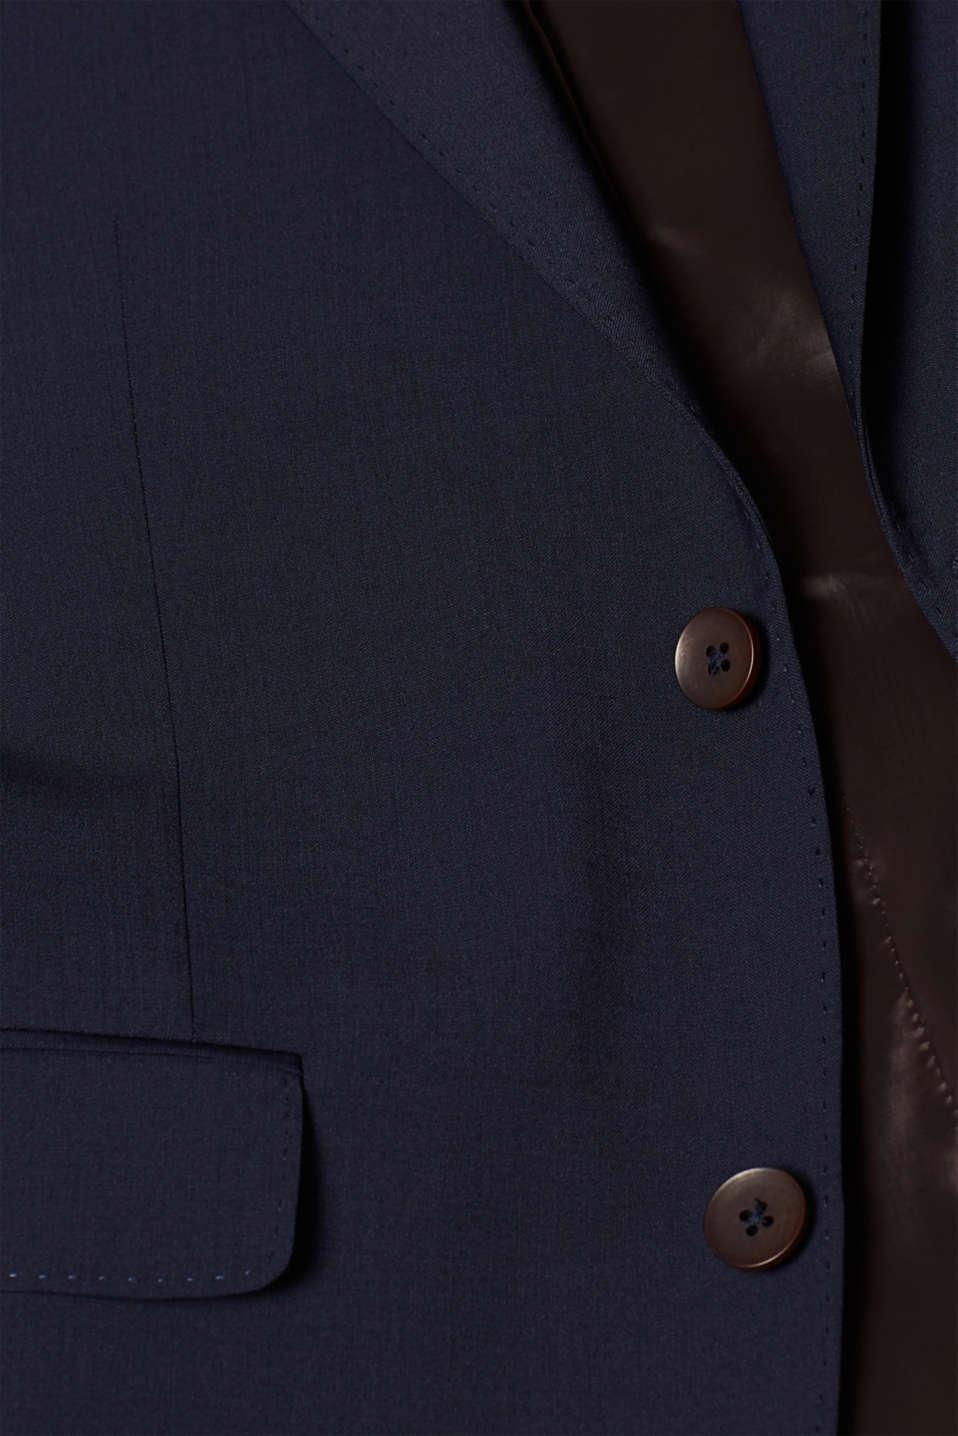 Blazers suit, NAVY, detail image number 4